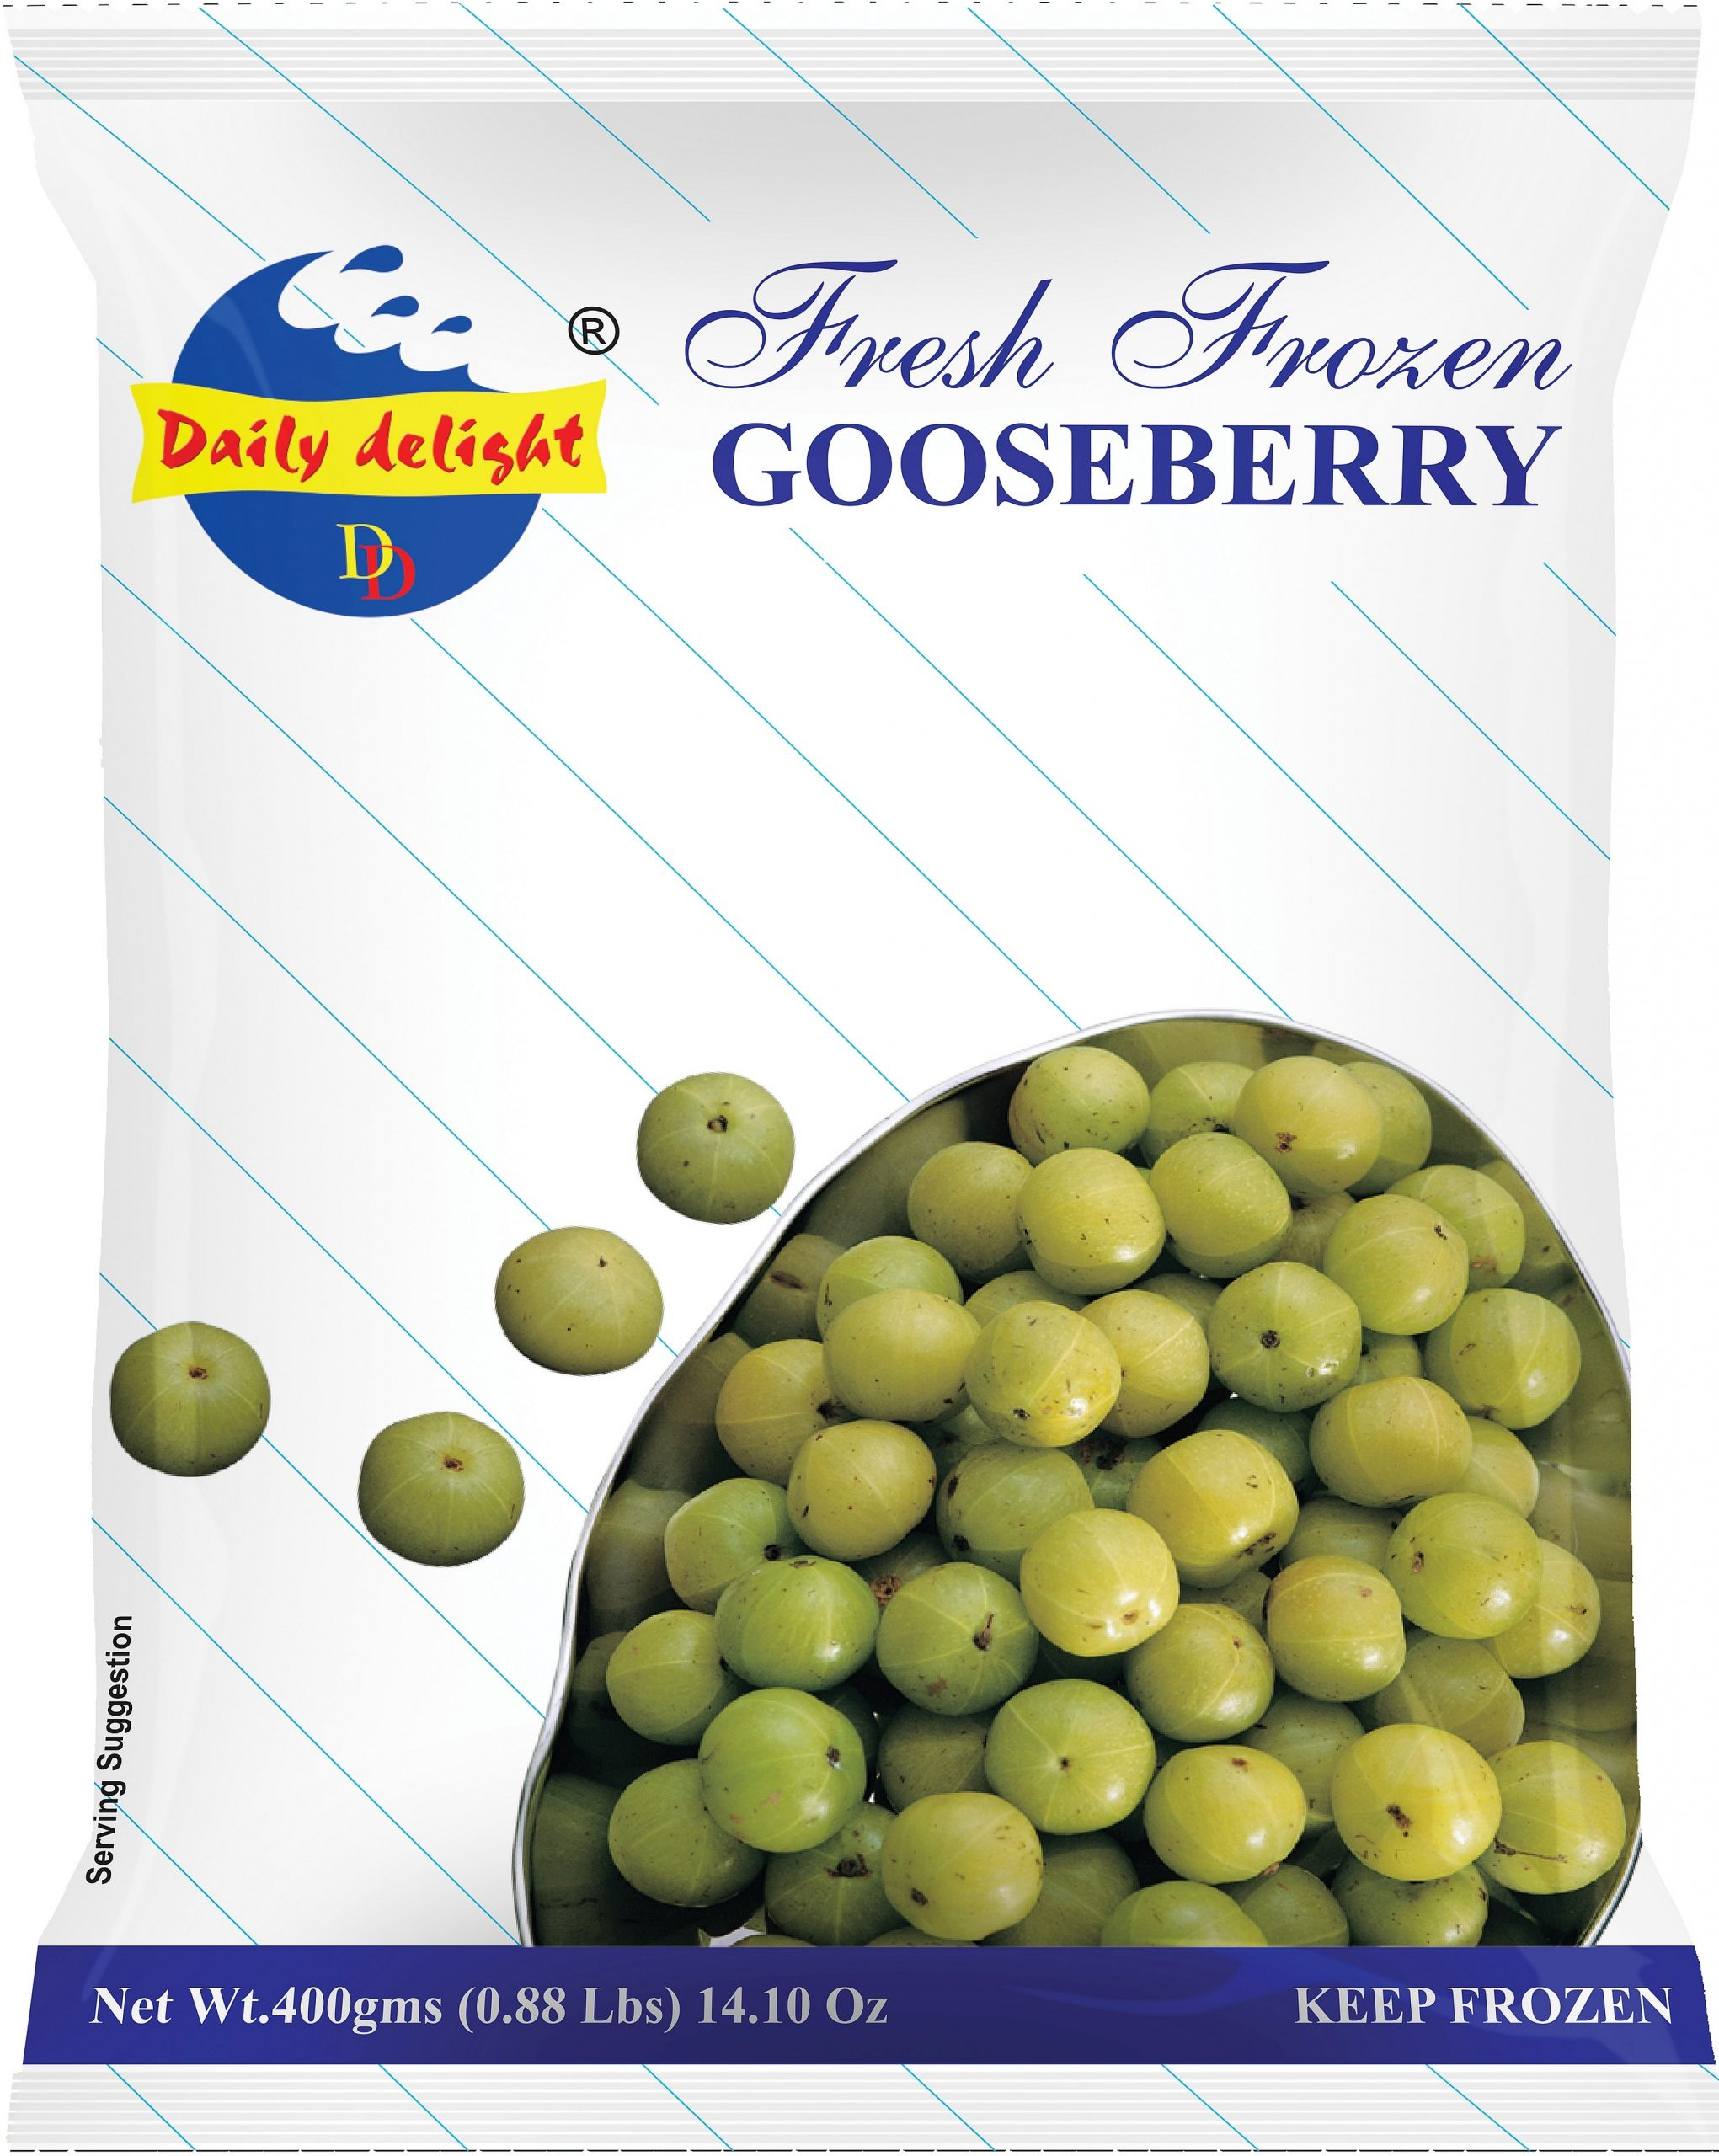 Daily Delight Gooseberry